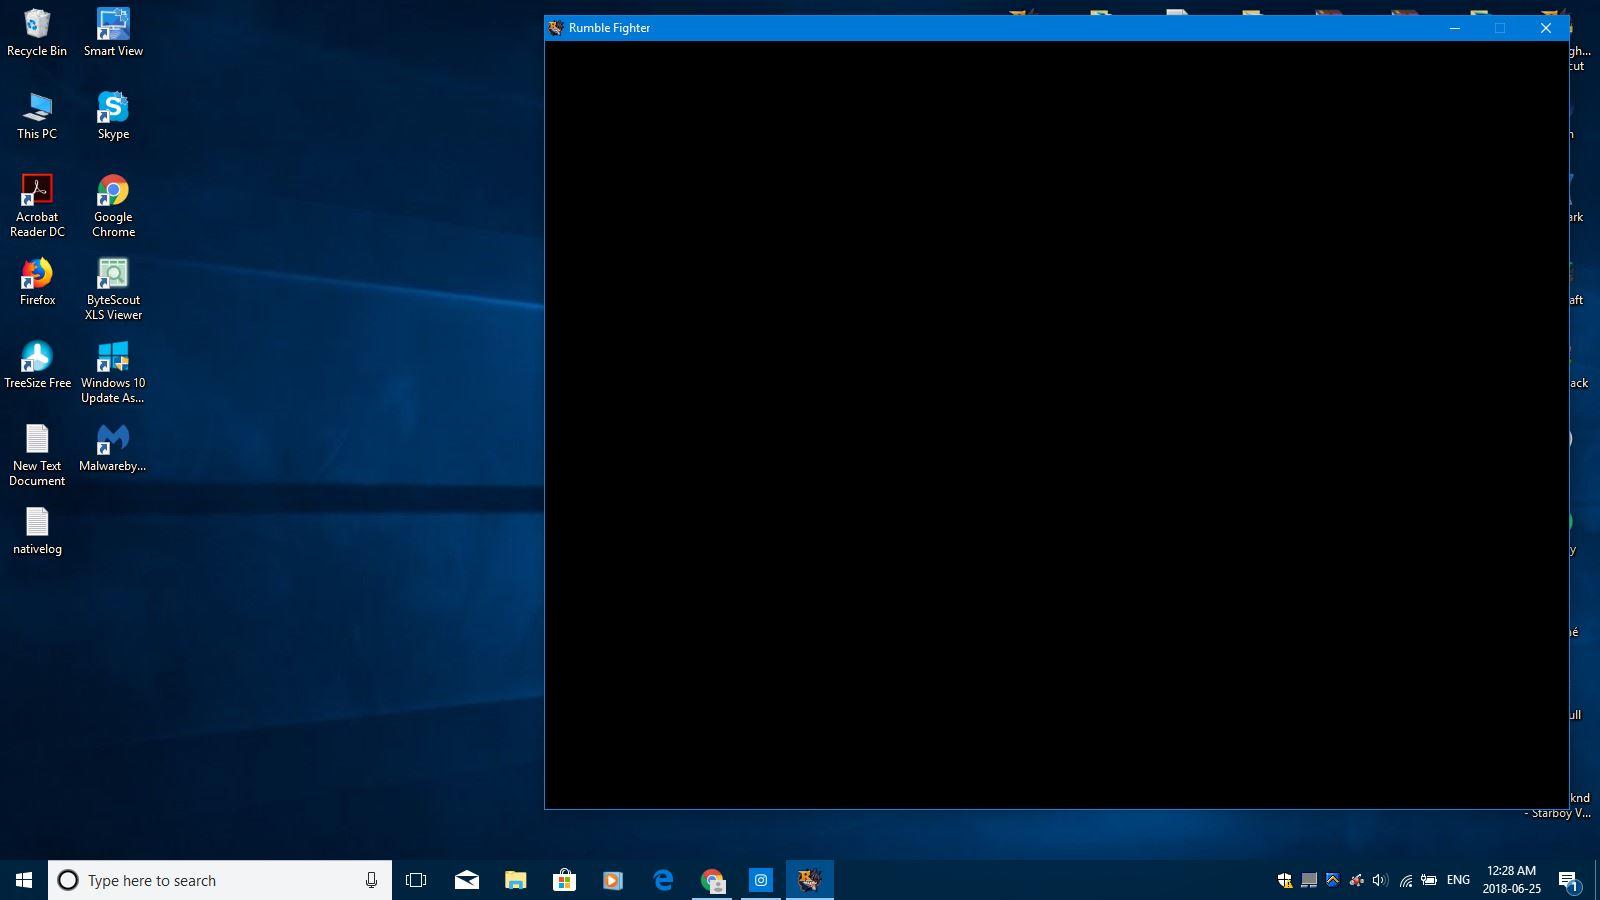 Black Screen when starting RF | RedFox Games